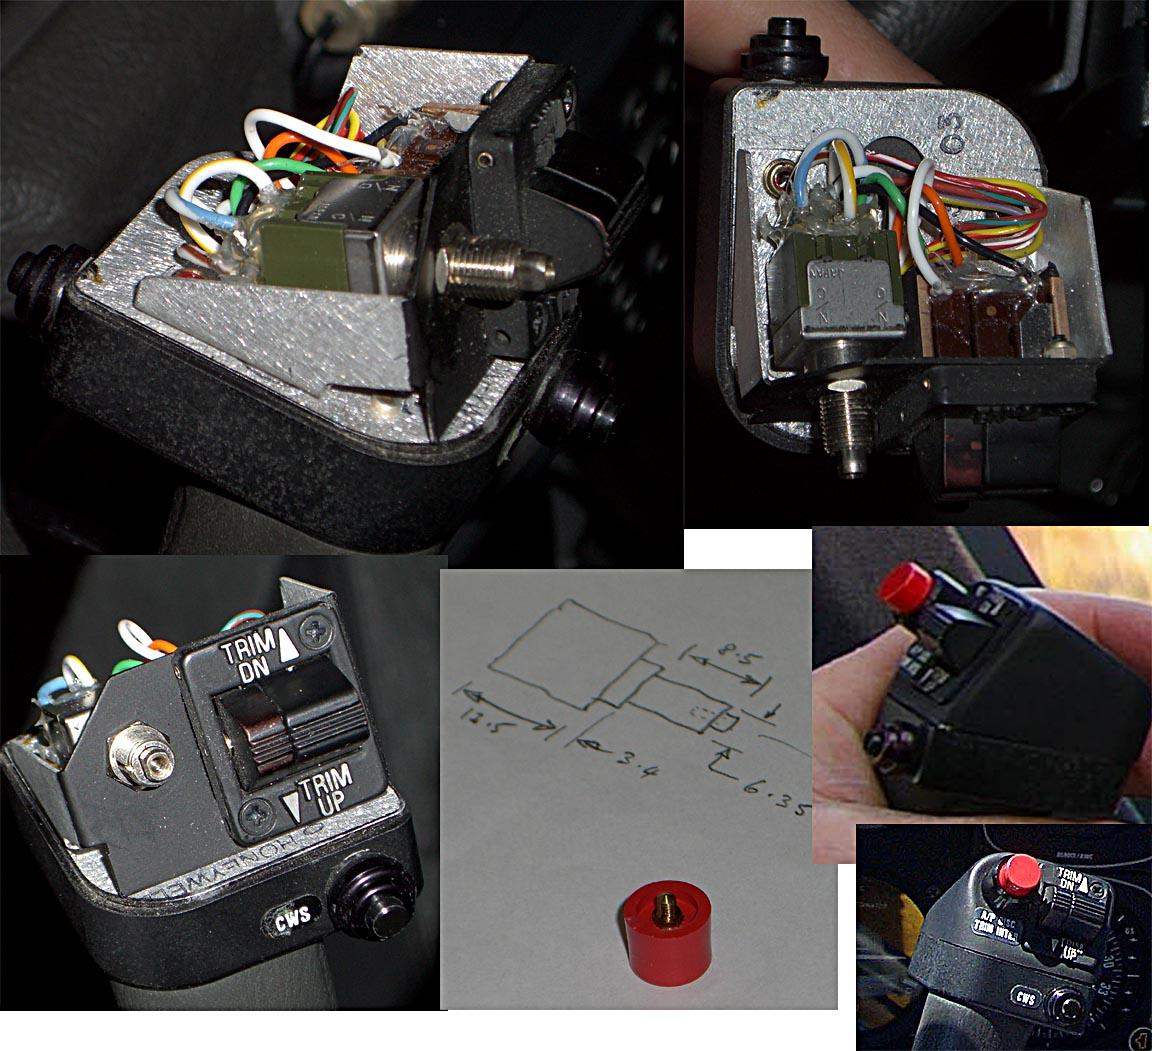 honeywell wiring diagram 2007 f150 power mirror kfc225 autopilot failures